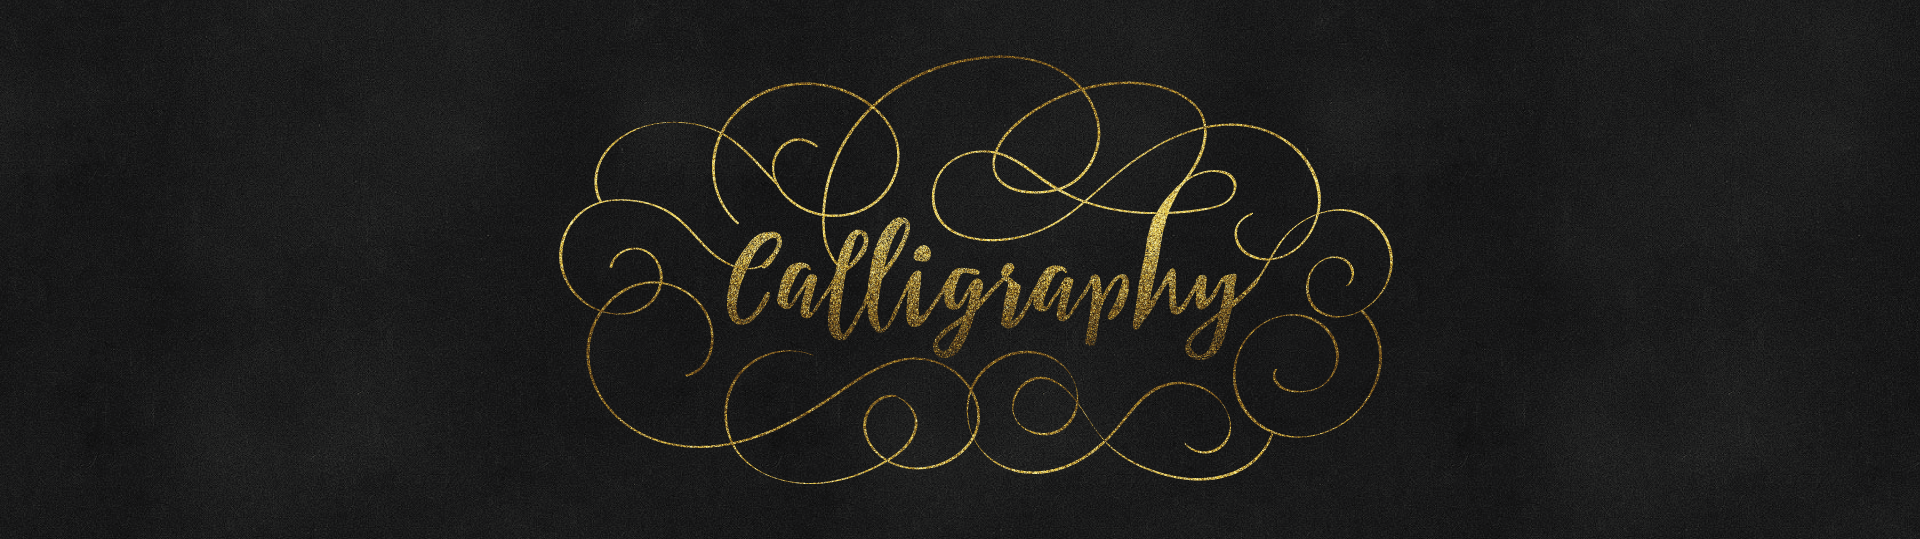 Calligraphy_Banner